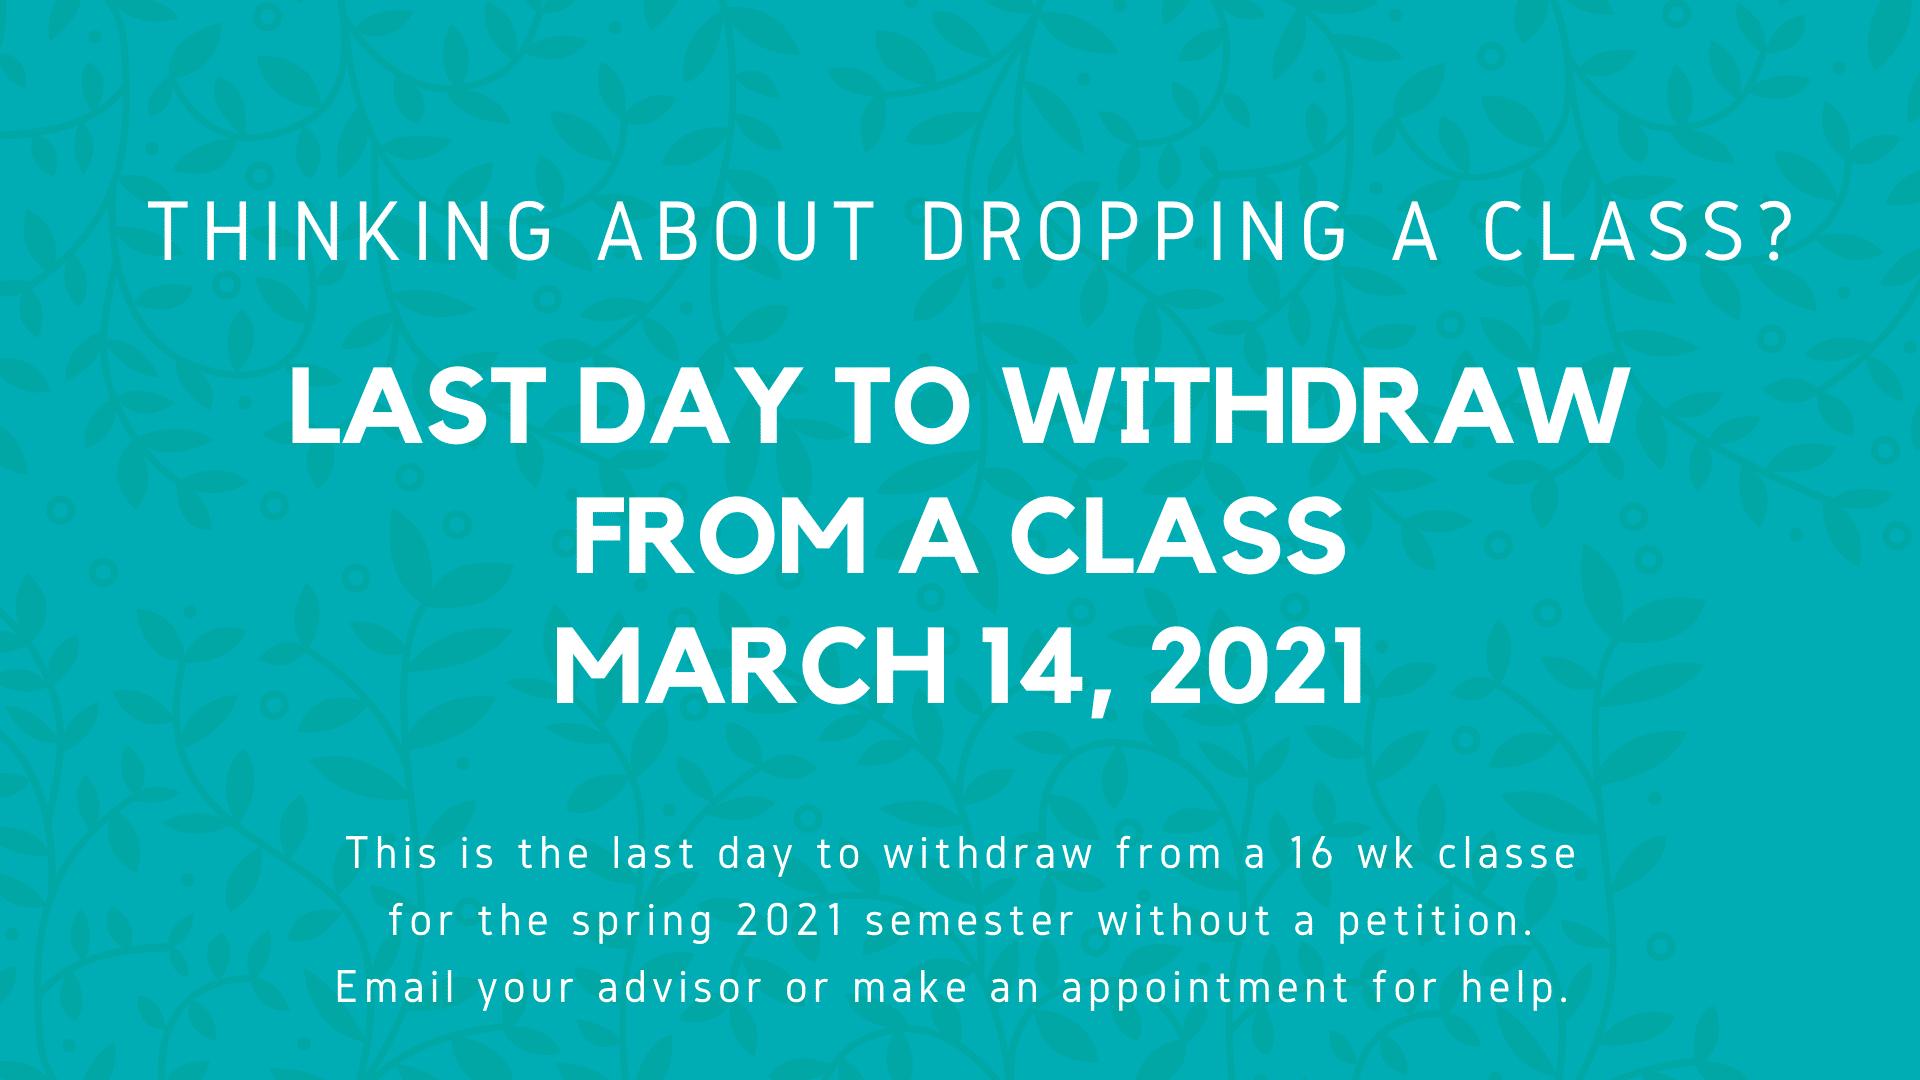 Gway - Last day to Add _ Drop Spring 2021